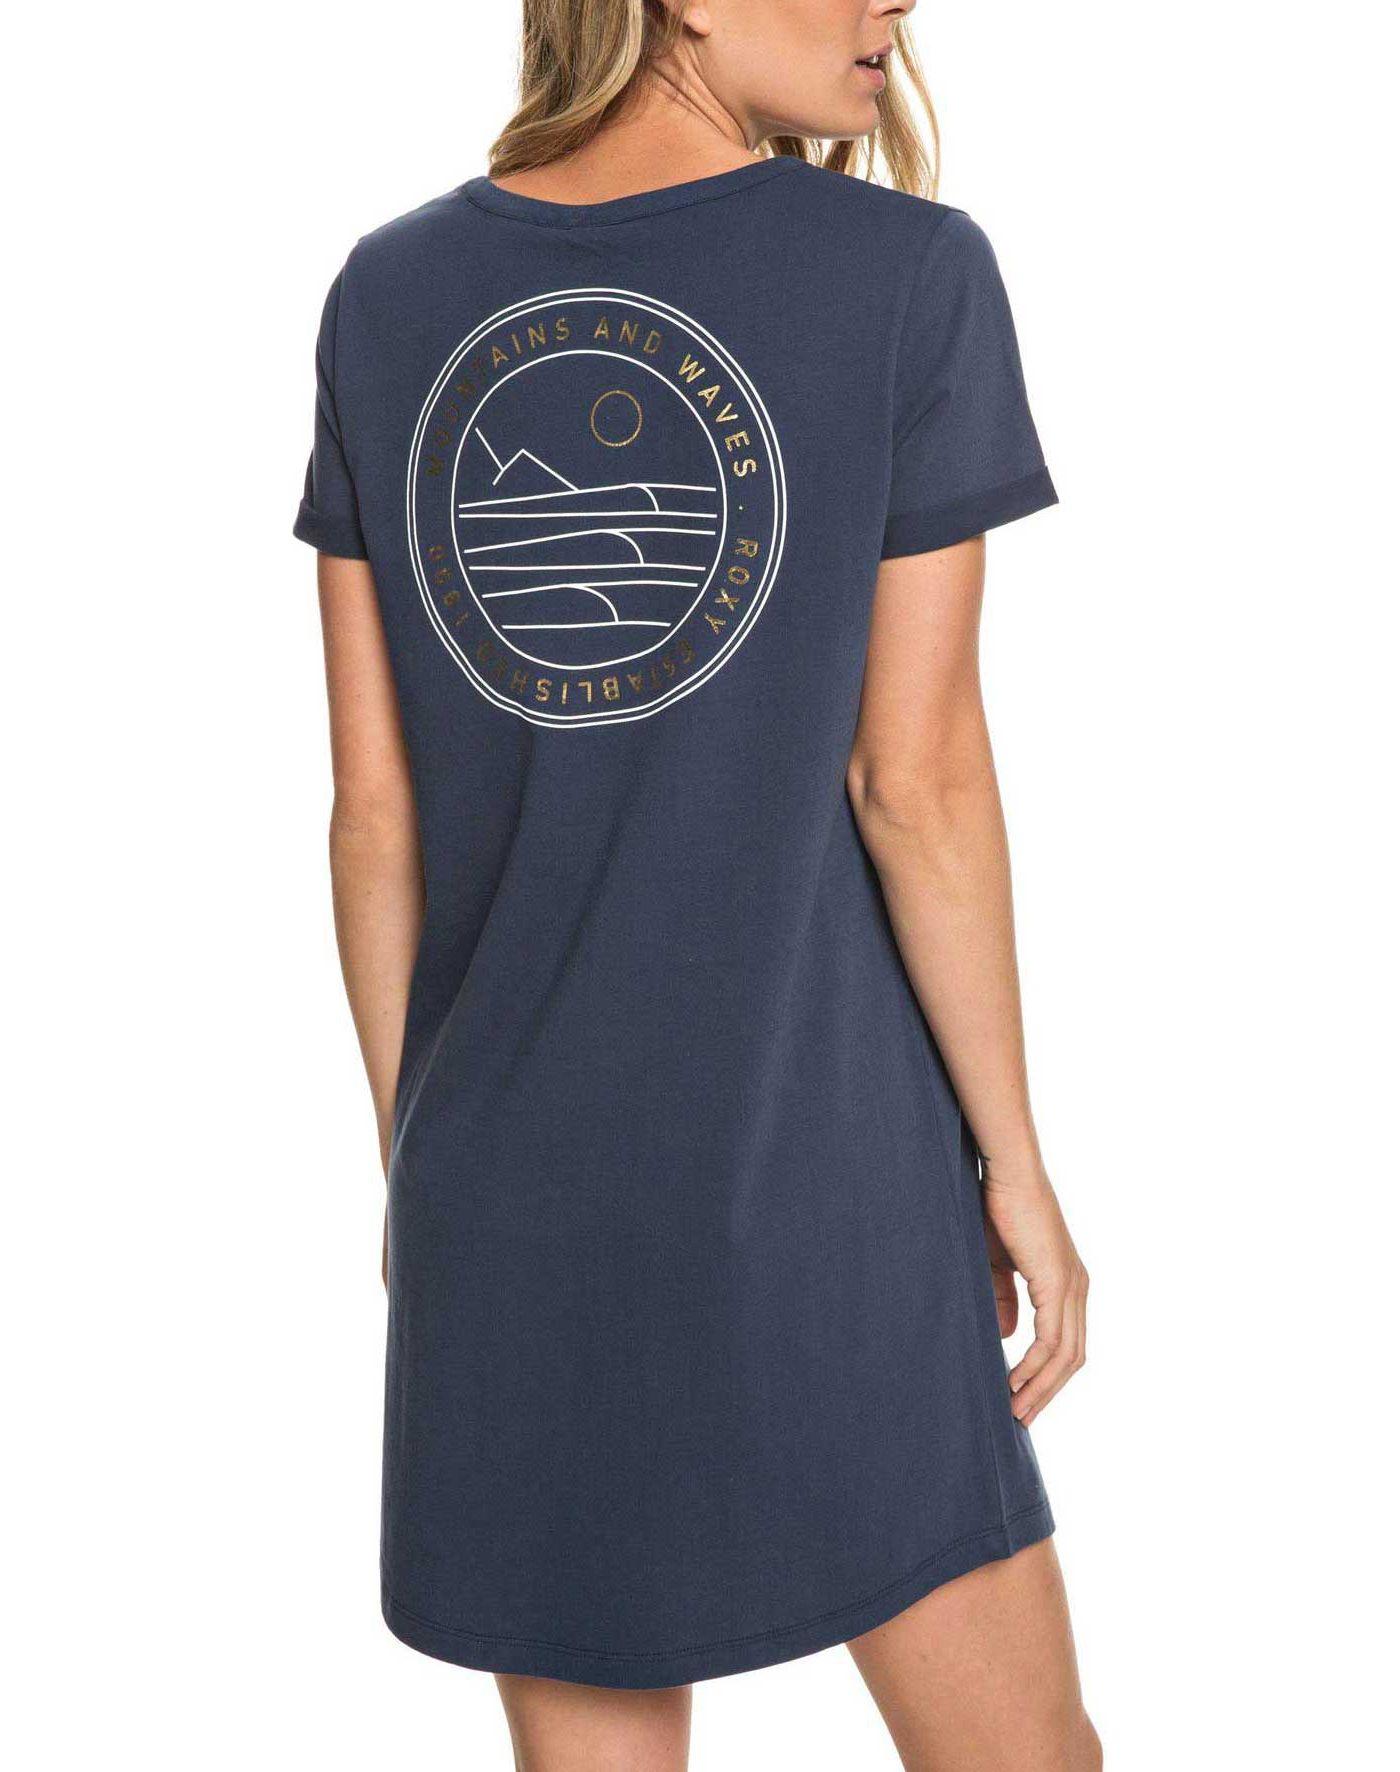 Roxy Women's On My Wave Short Sleeve T-Shirt Dress